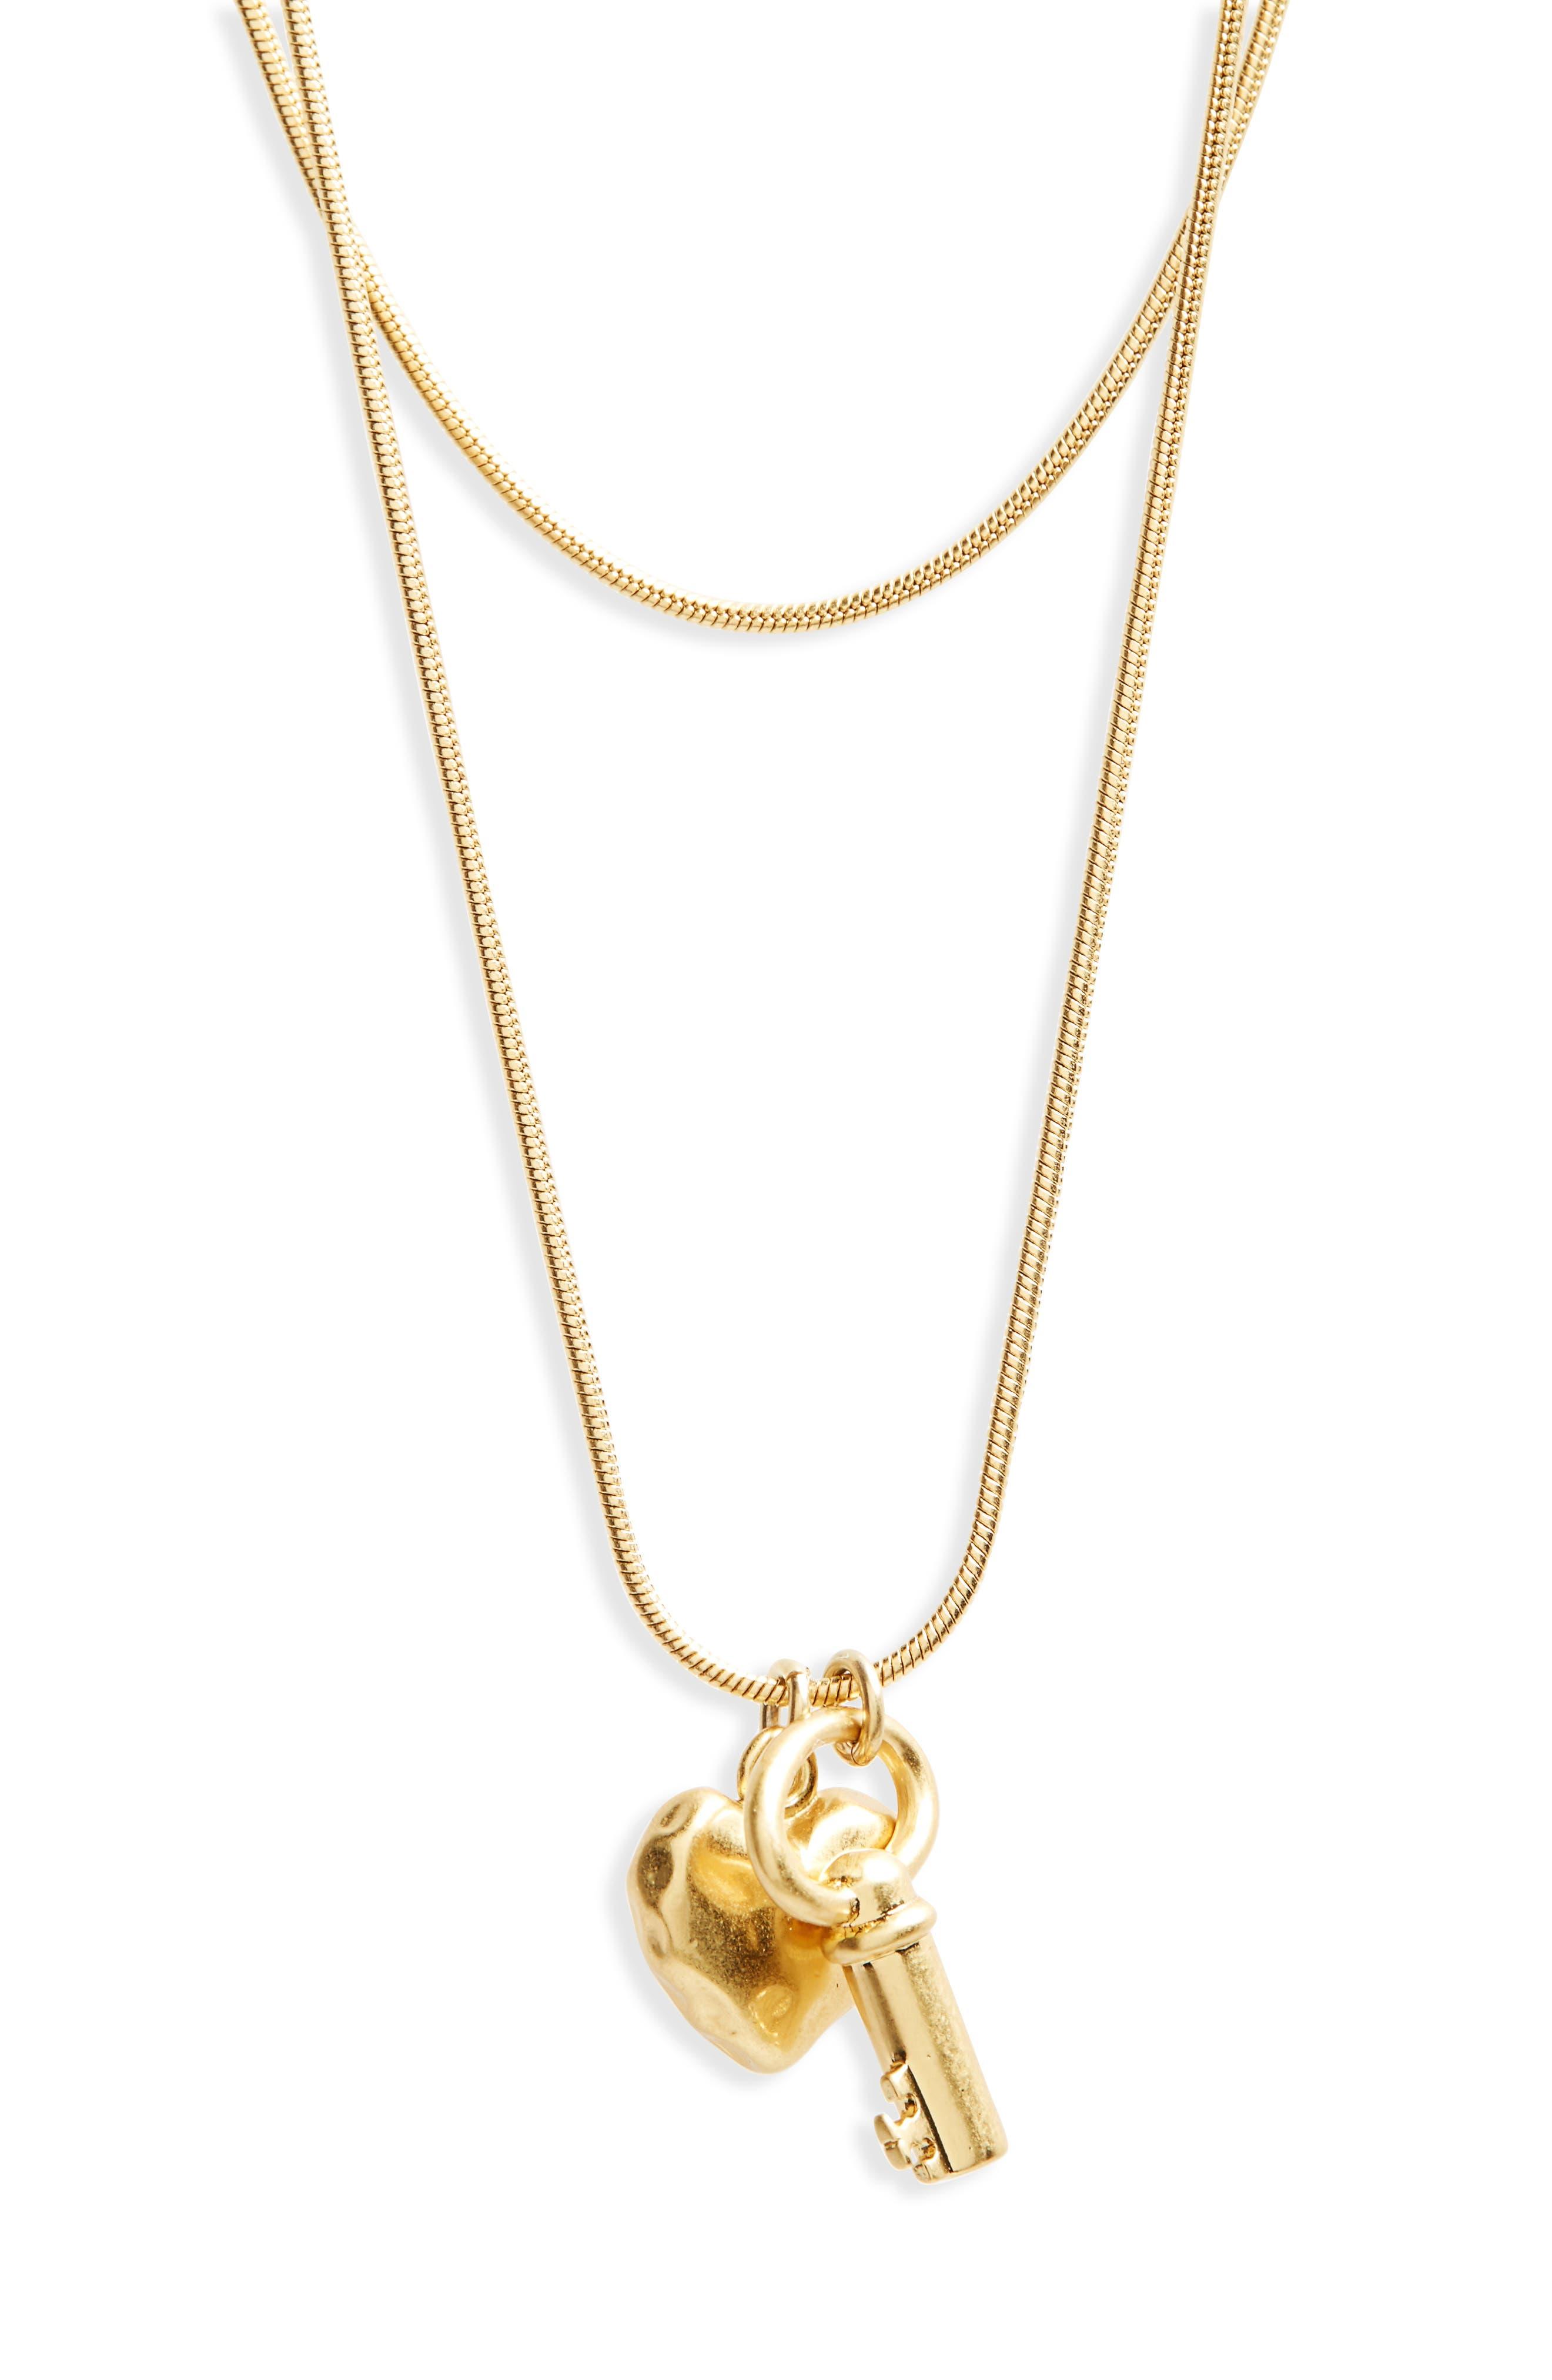 Main Image - Tory Burch Key & Heart Charm Layered Pendant Necklace